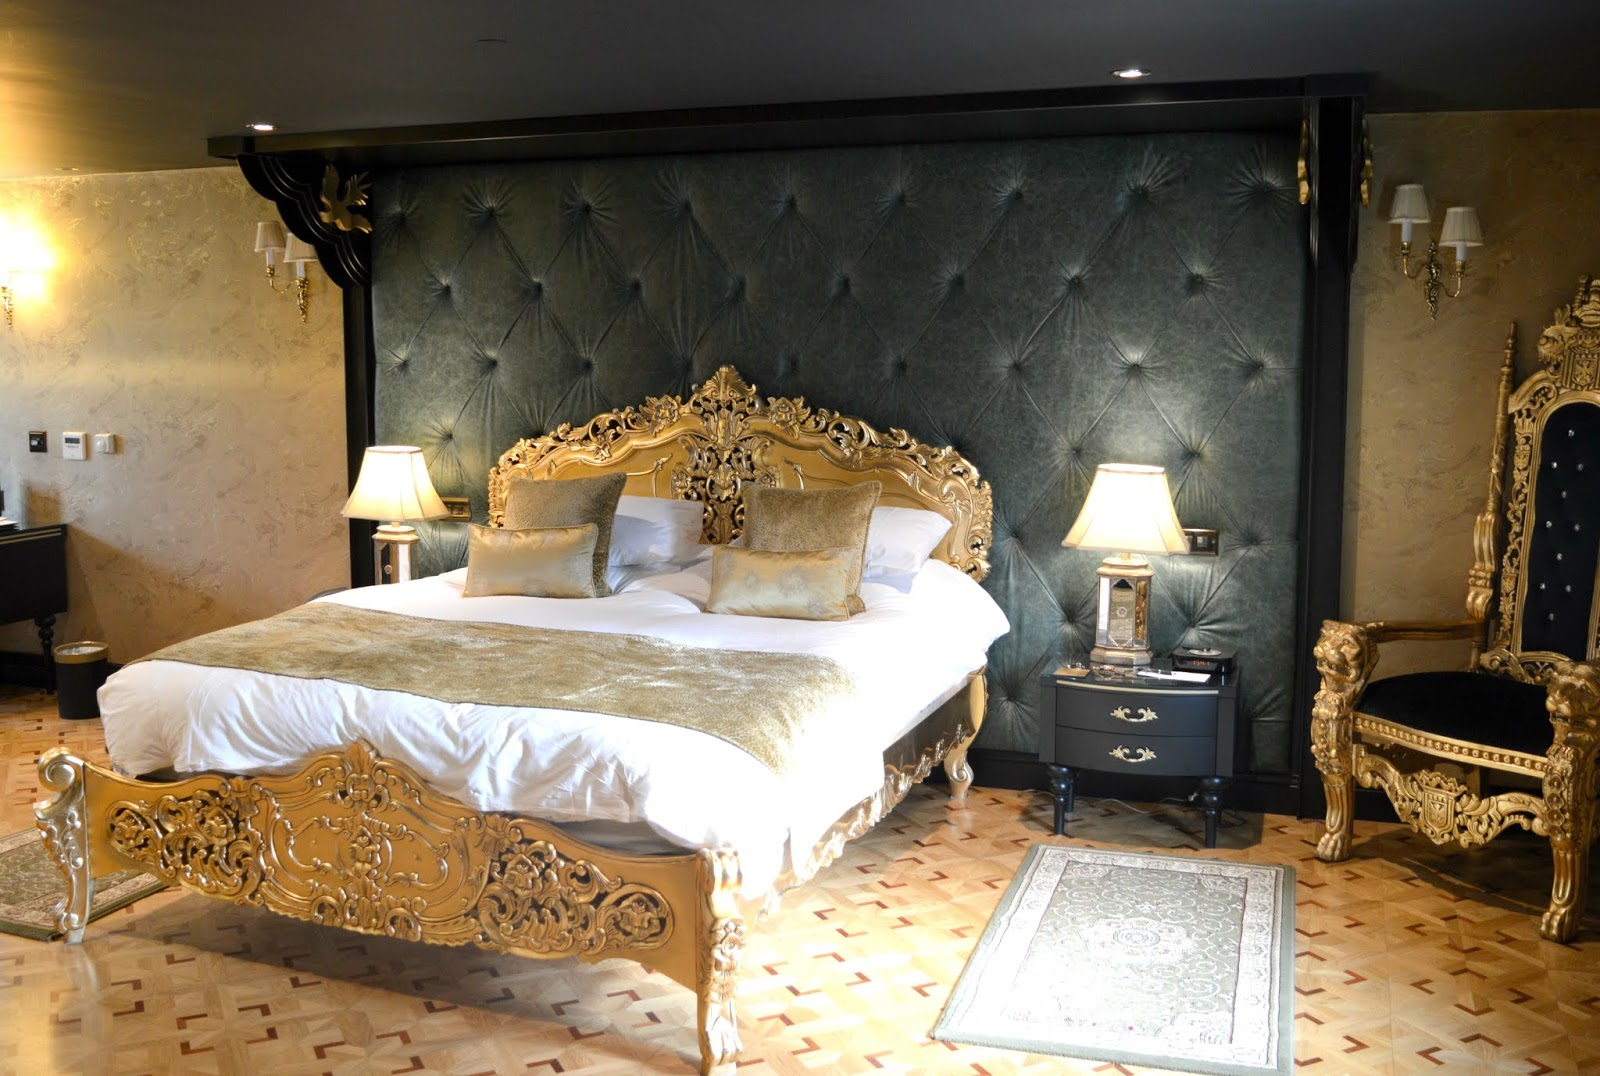 Luxury Room at Crab & Lobster, Thirsk